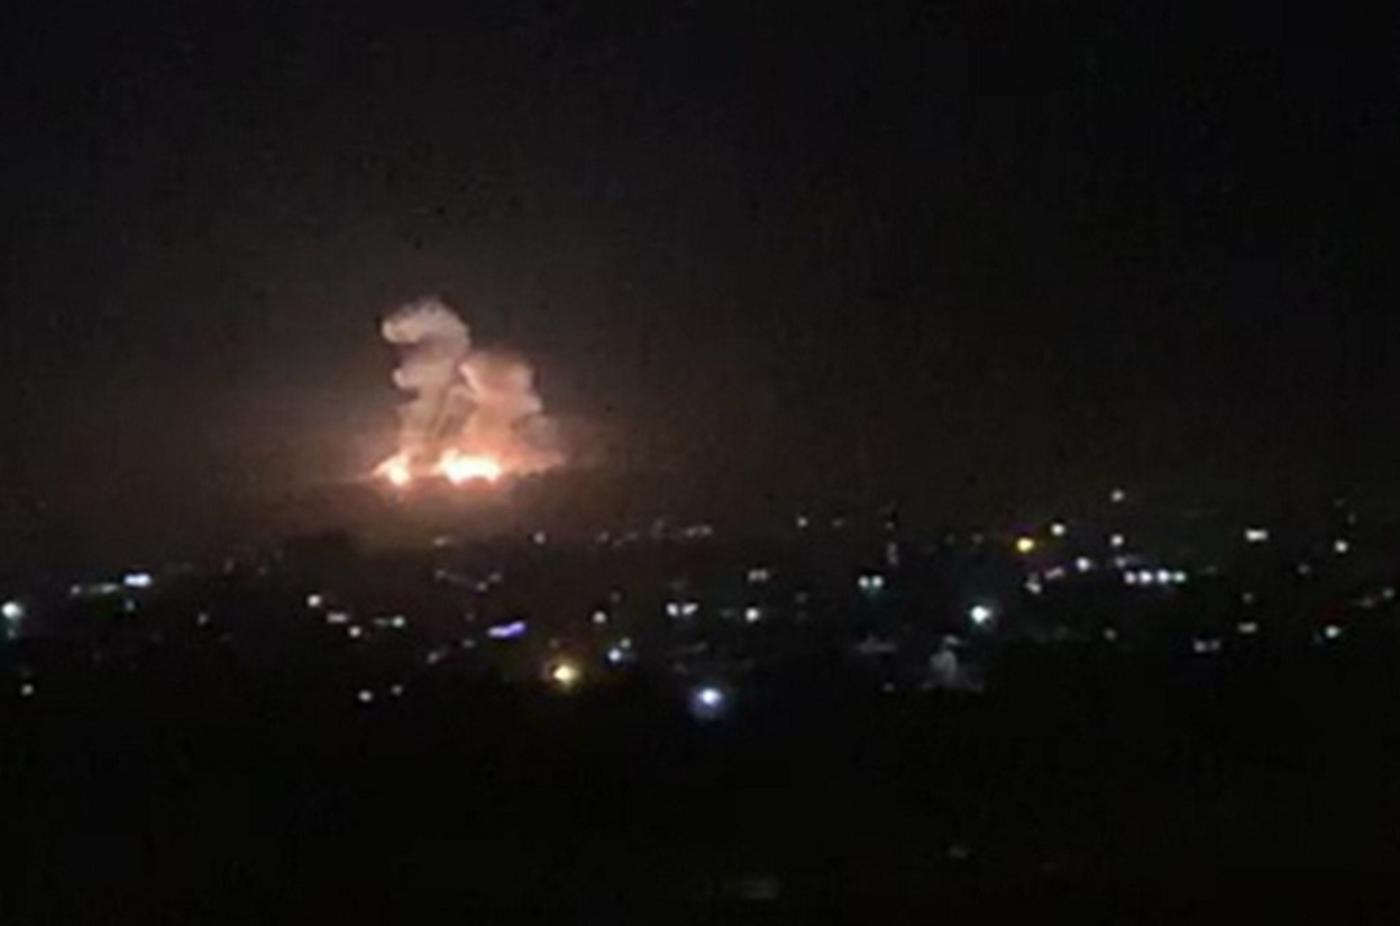 Israel bombs Damascus, killing 7, including 4 Iranians